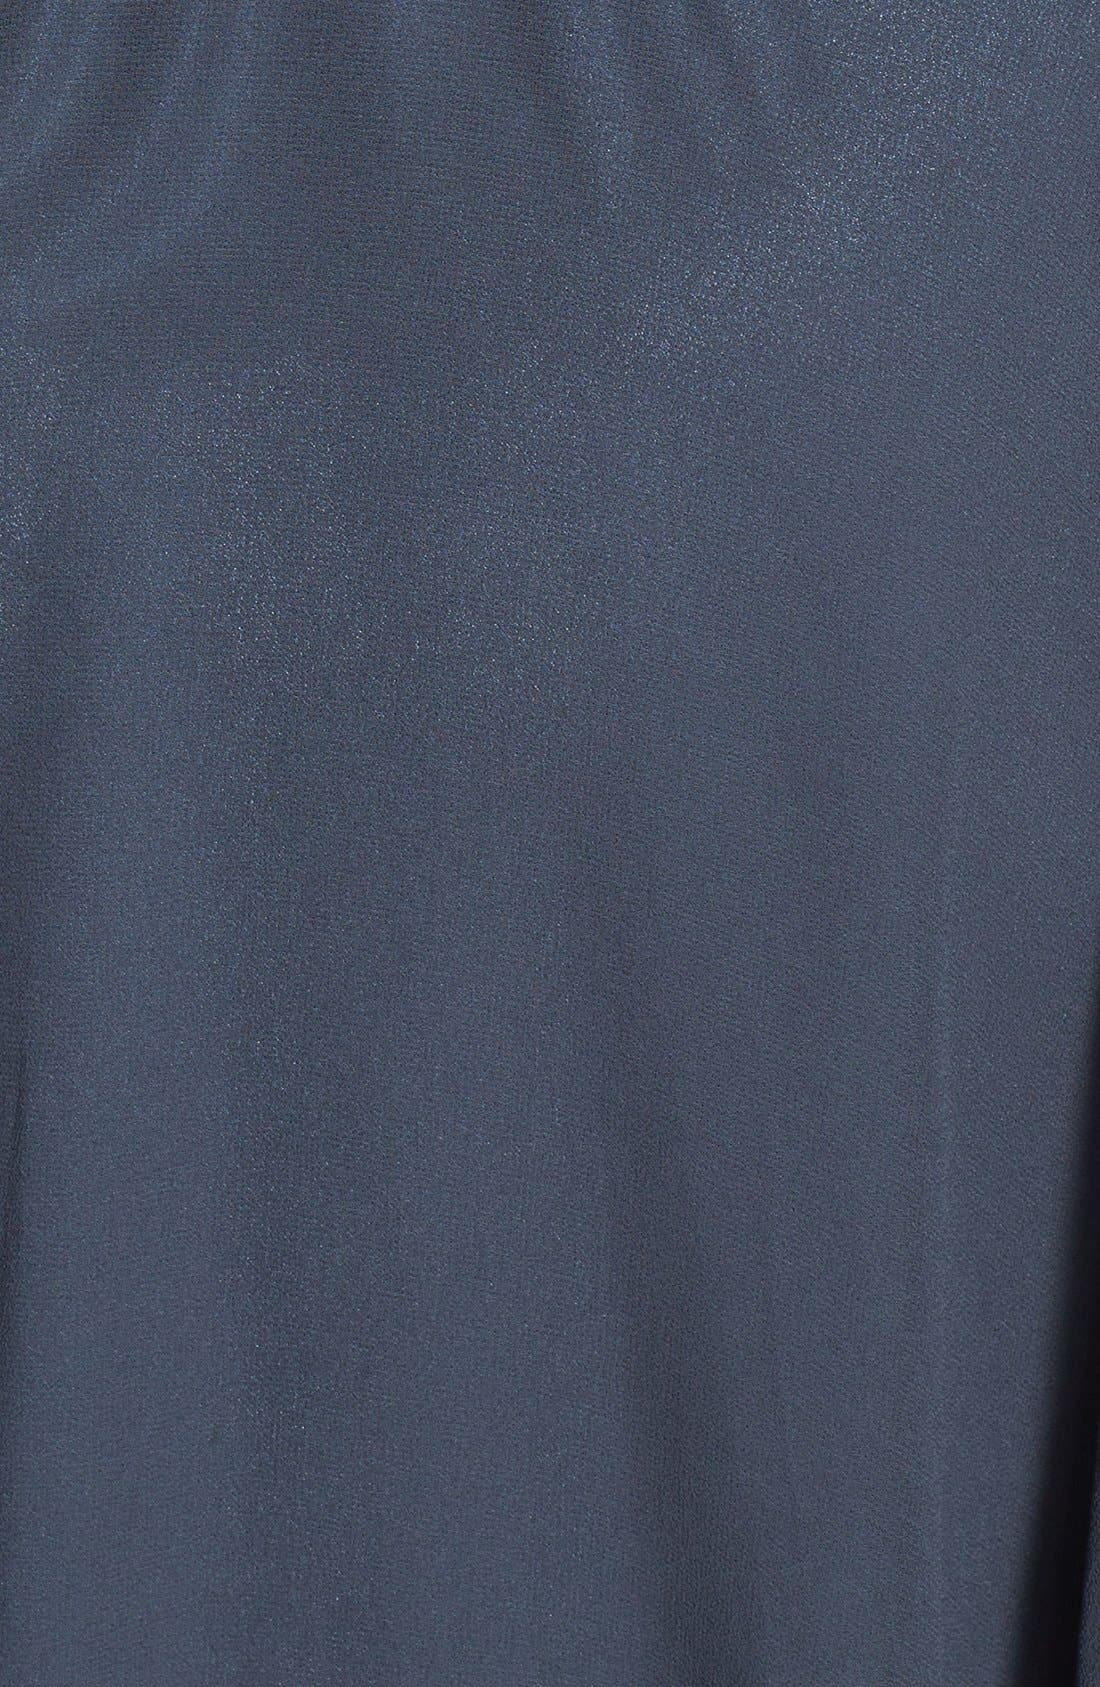 Alternate Image 3  - J Kara Beaded Dress (Plus Size)